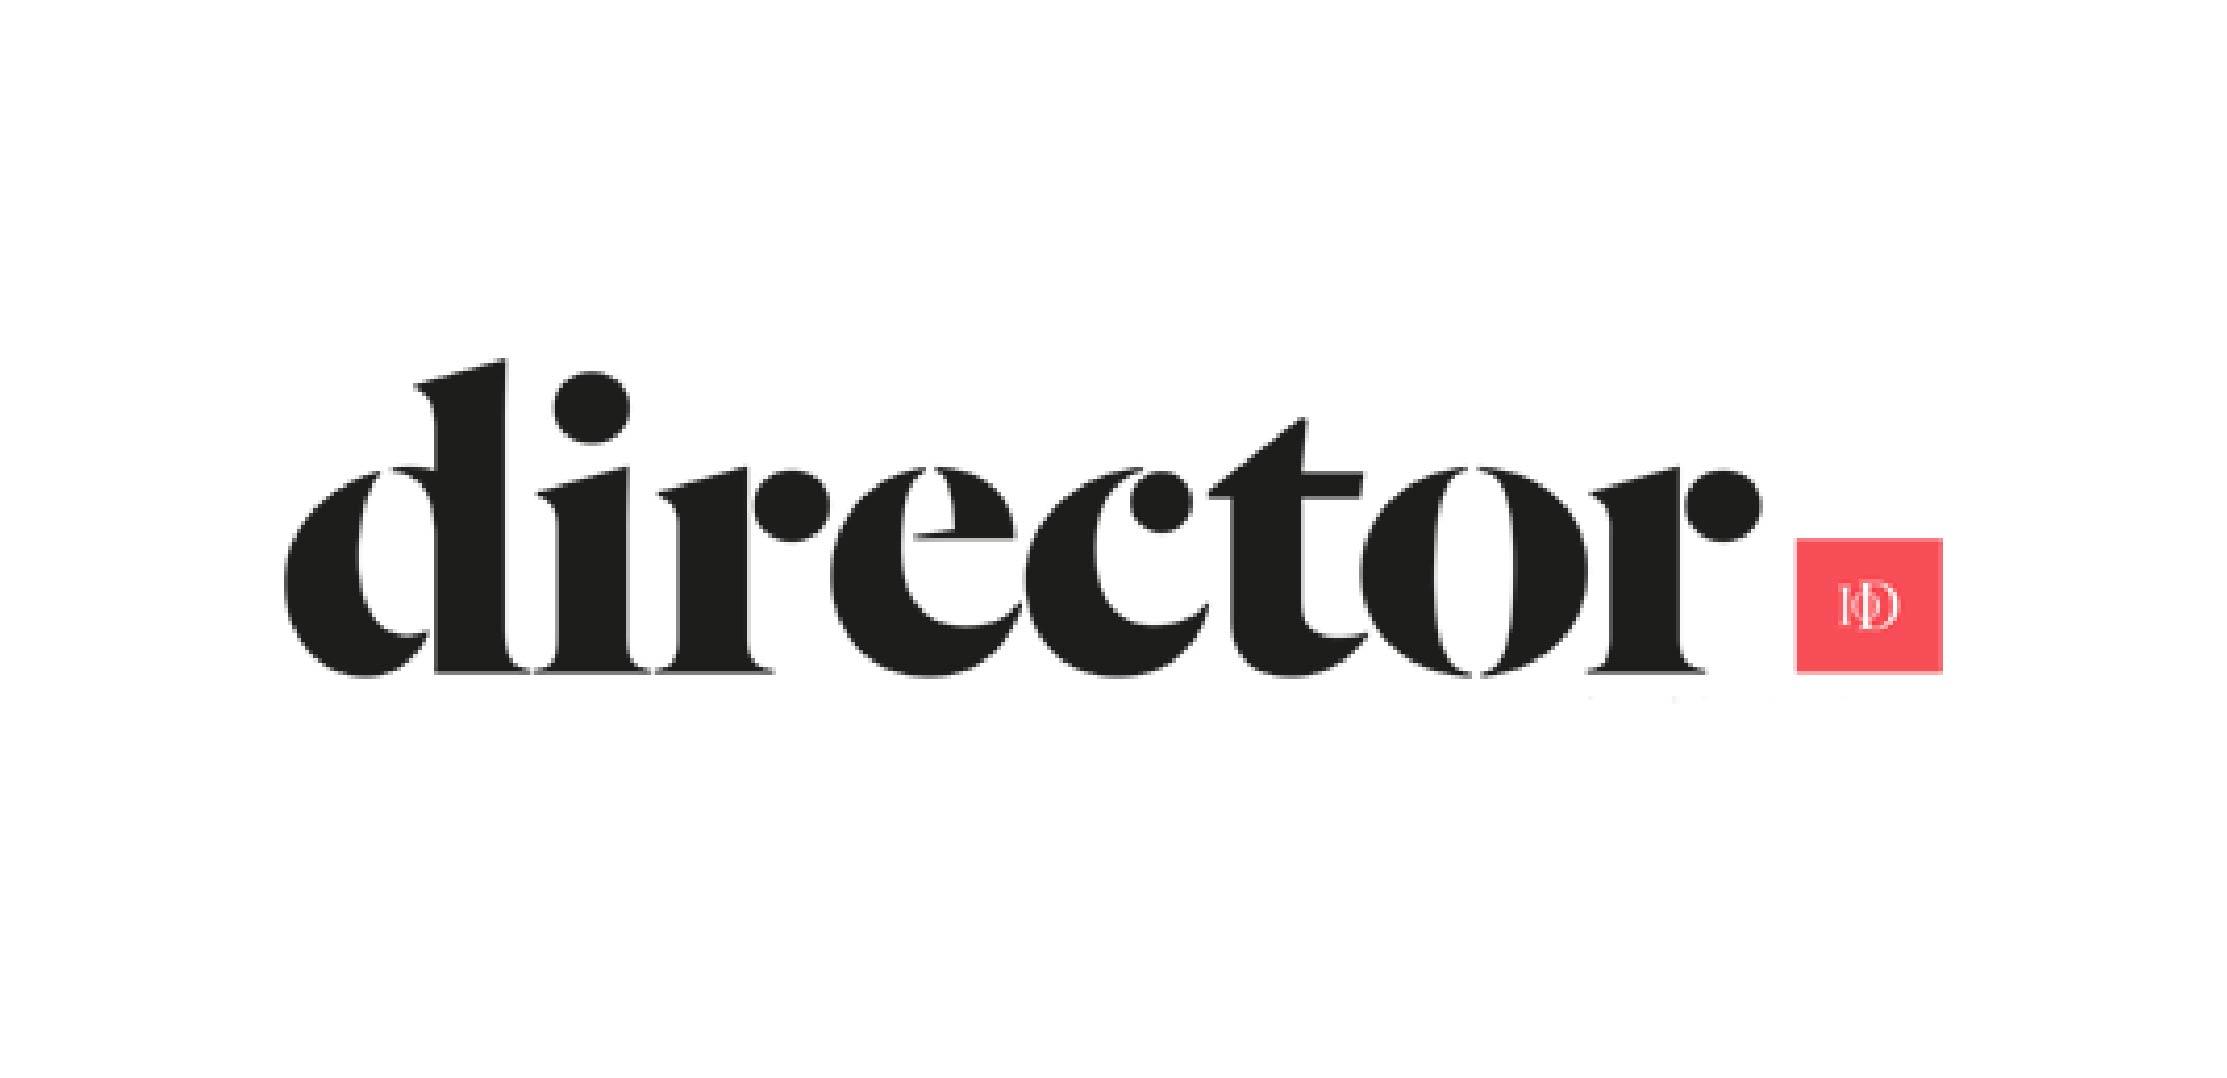 director-iod-logo